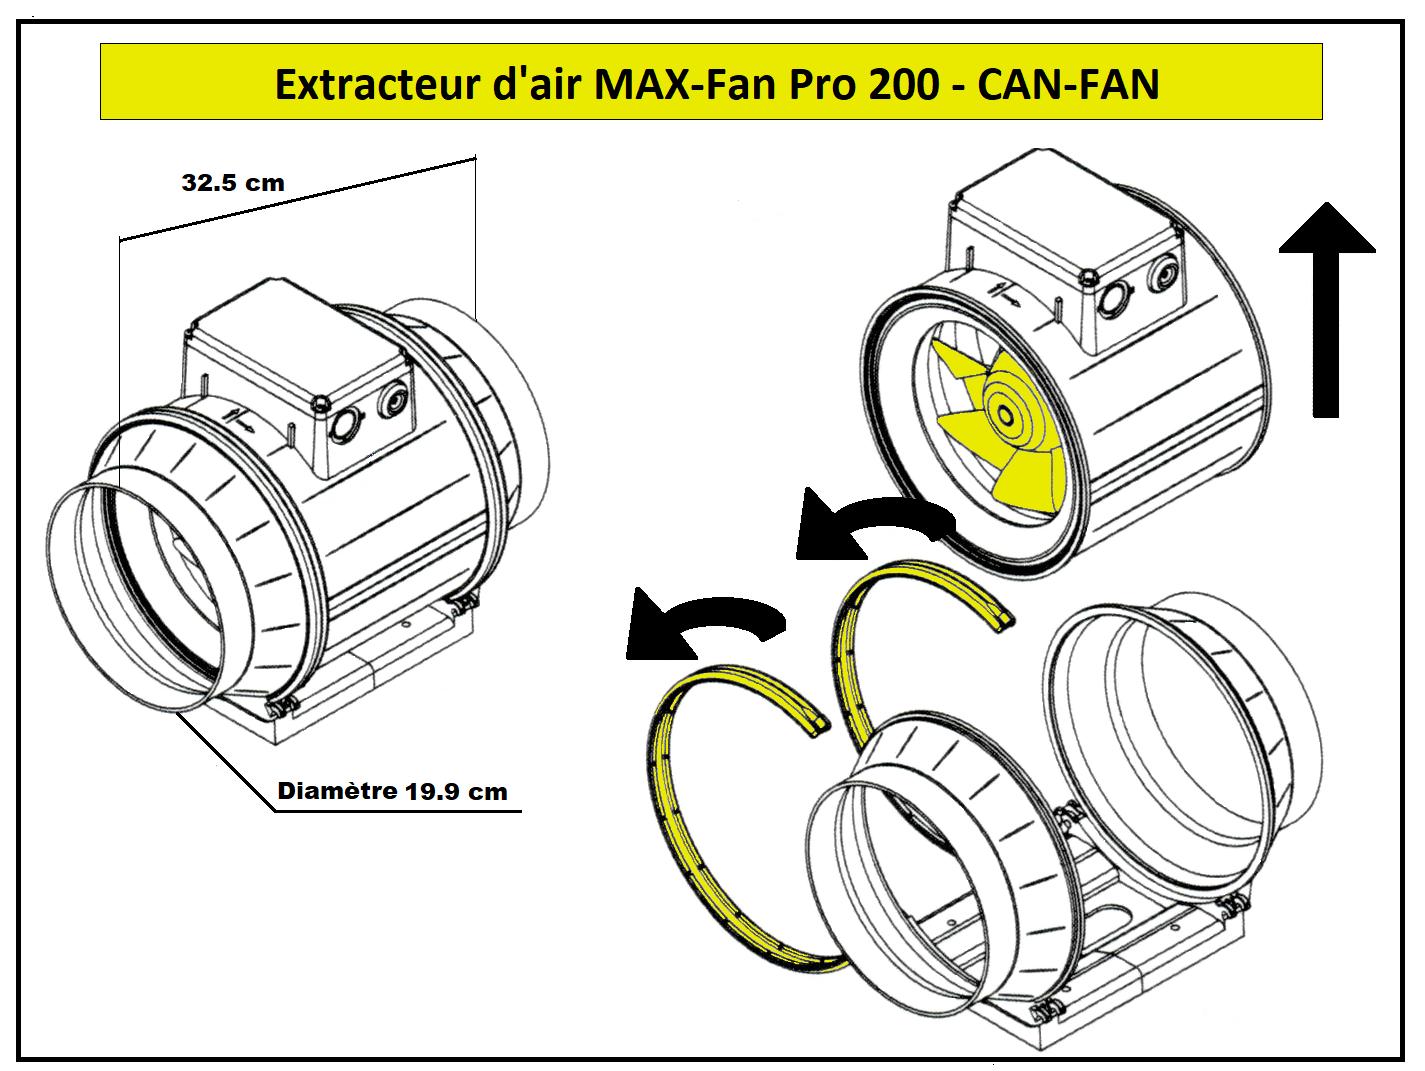 Extracteur de gaine Can-Fan avec sortie 200mm